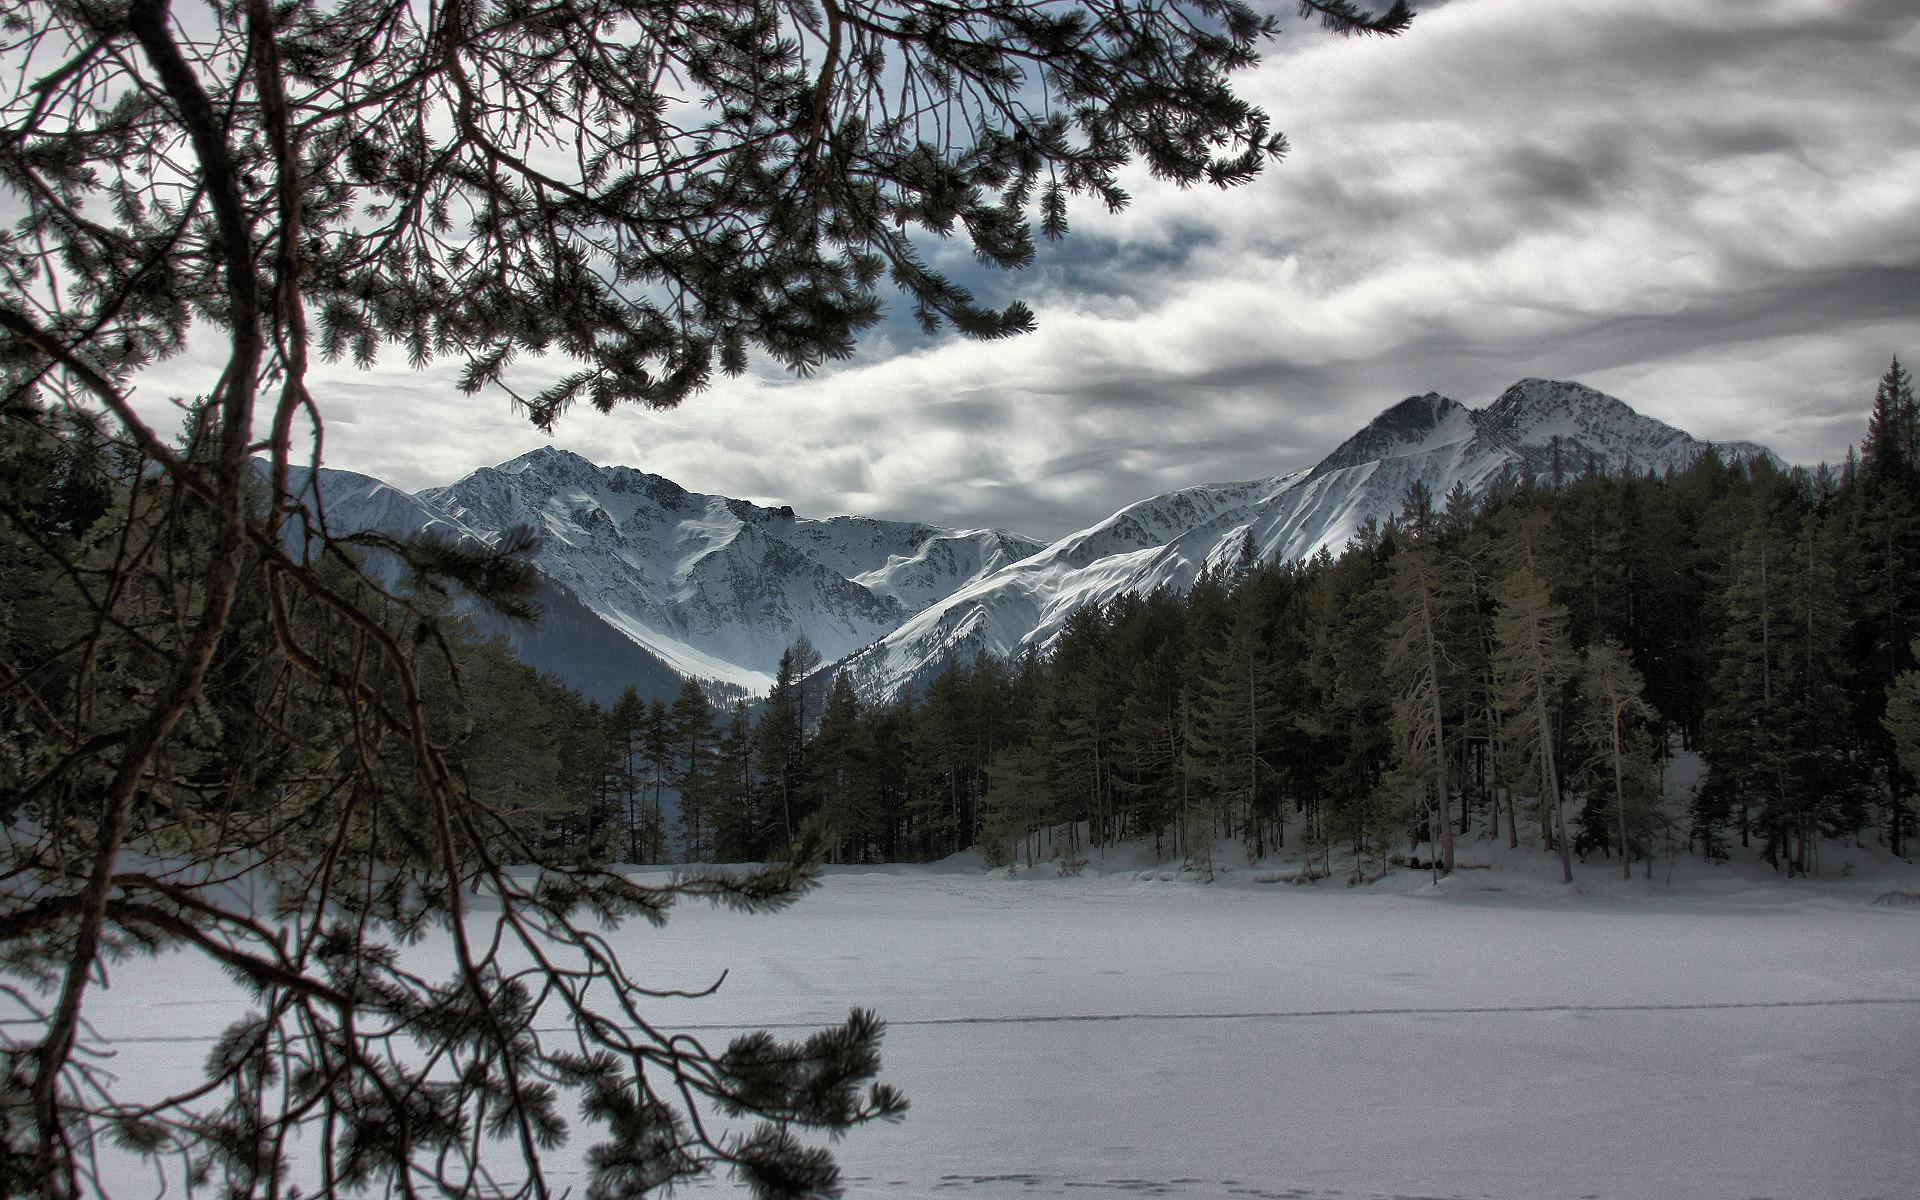 … wallpaper winter snow tree mountains forest desktop wallpaper …